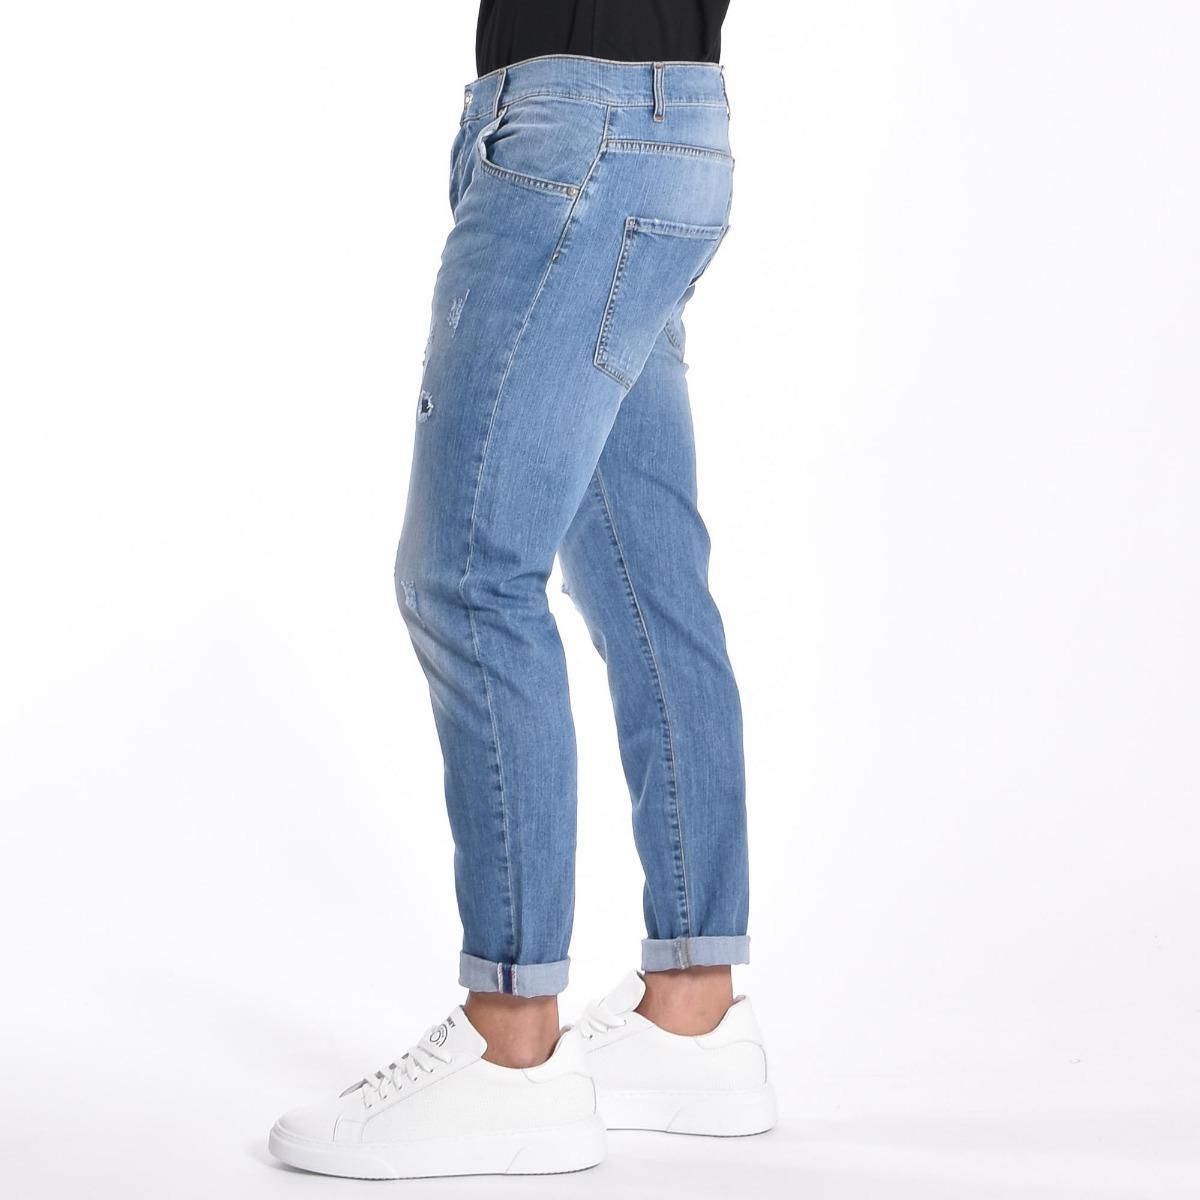 Jeans rotture- Denim chiaro